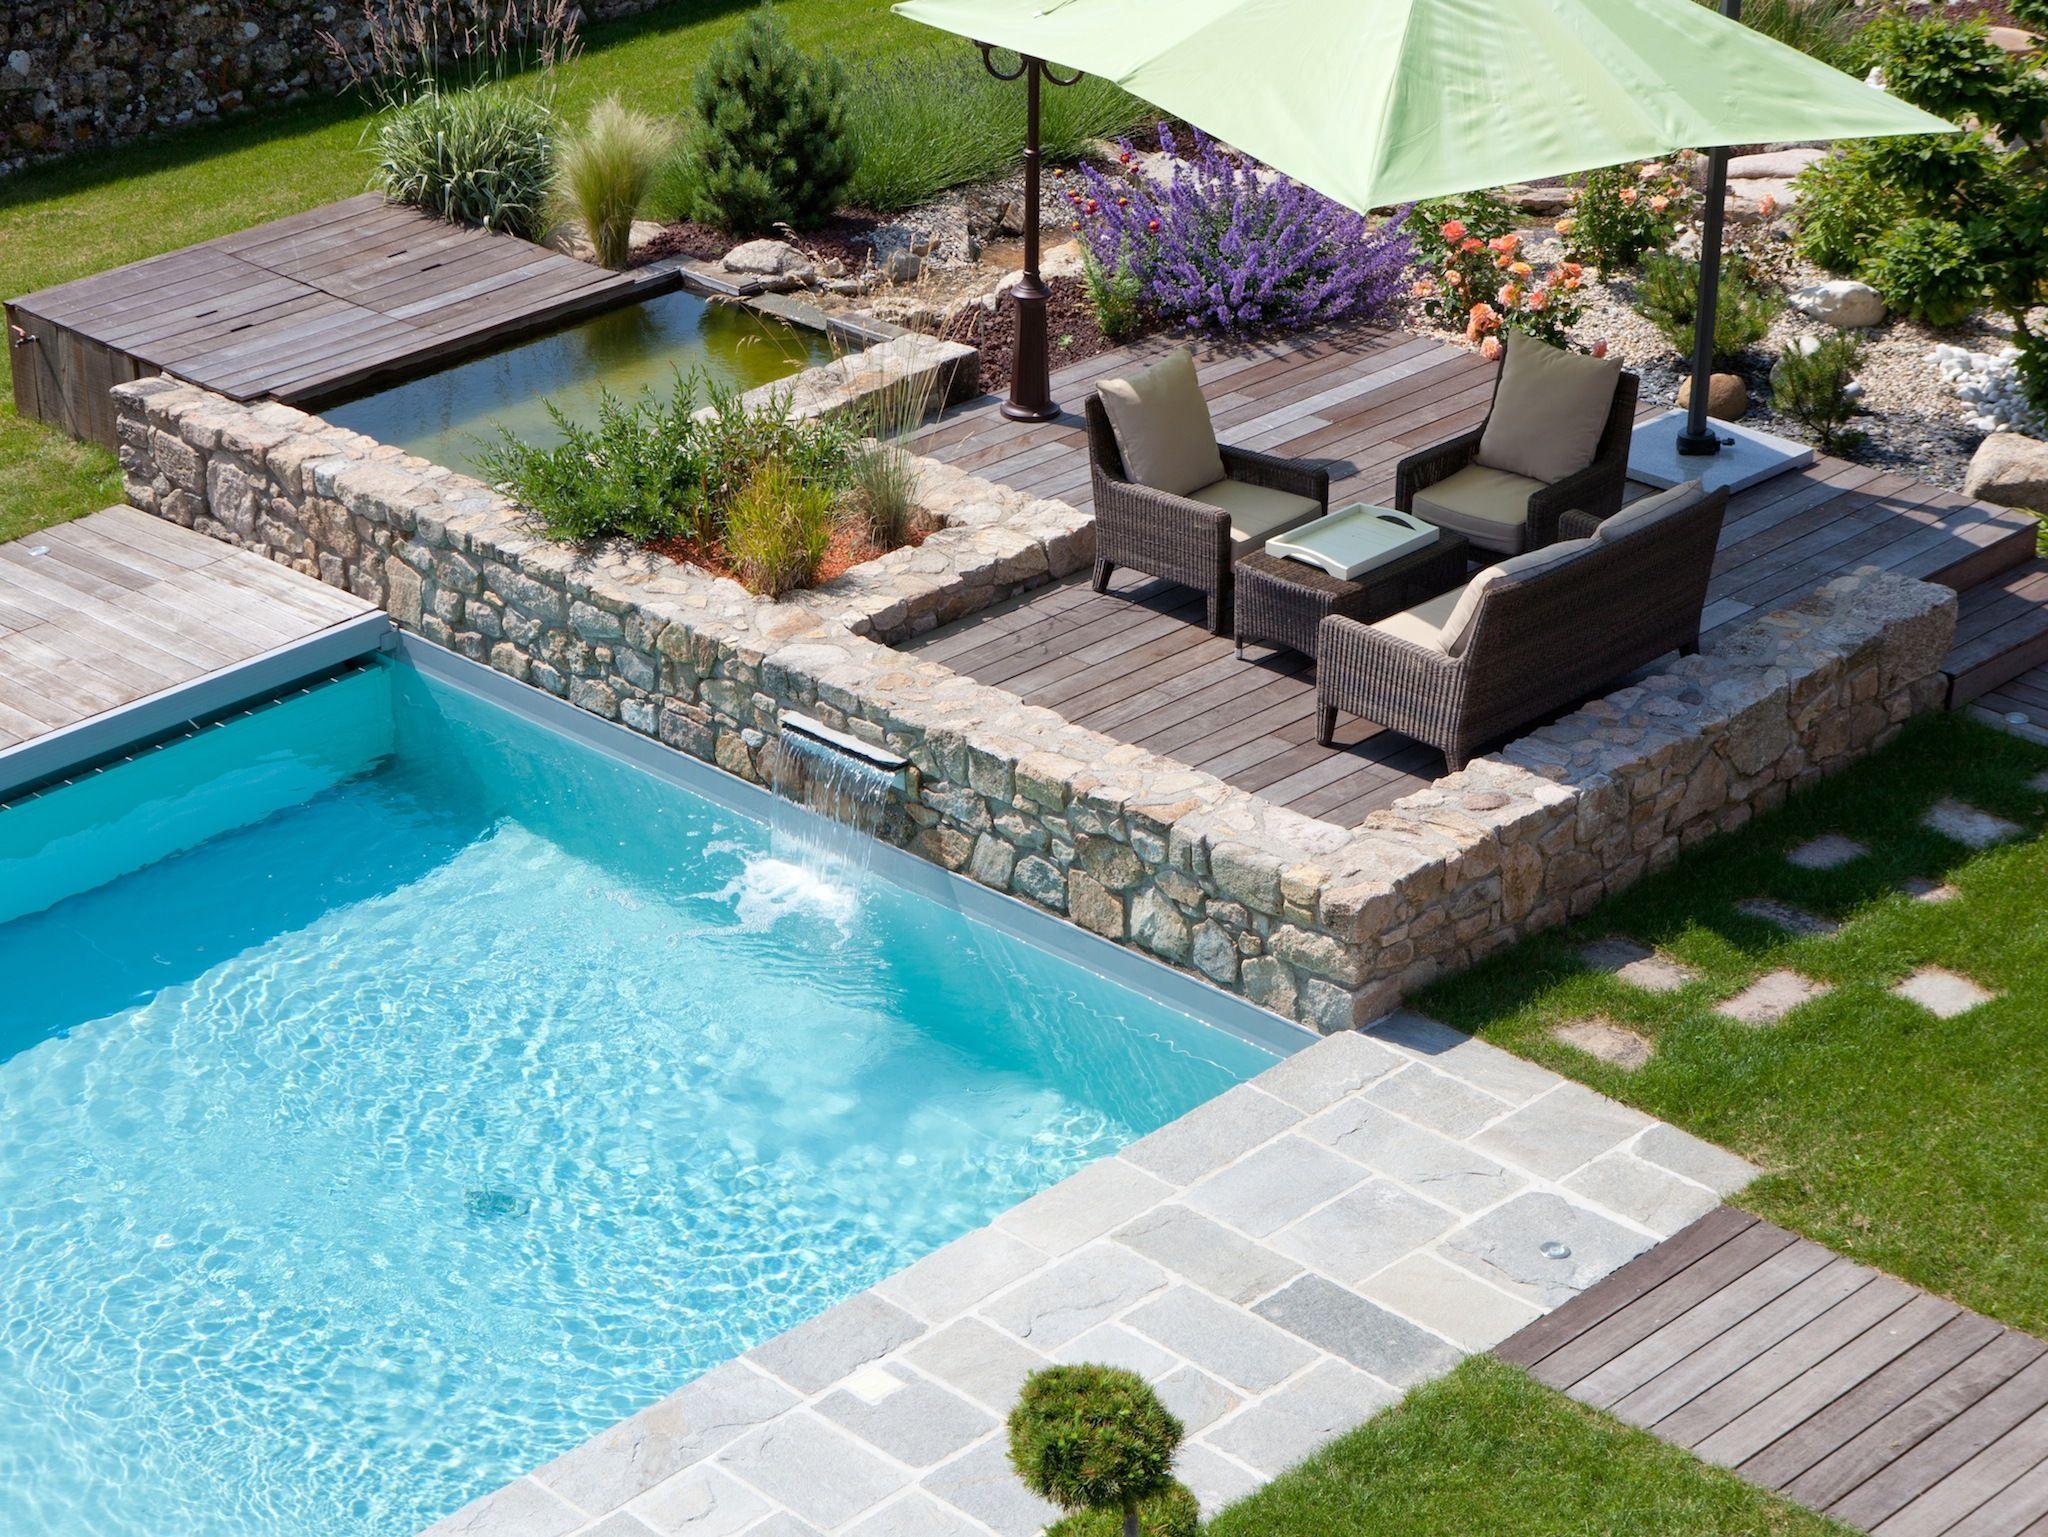 La piscine paysag e par l 39 esprit piscine piscine 6 x 5 m for Coque piscine carree 5x5